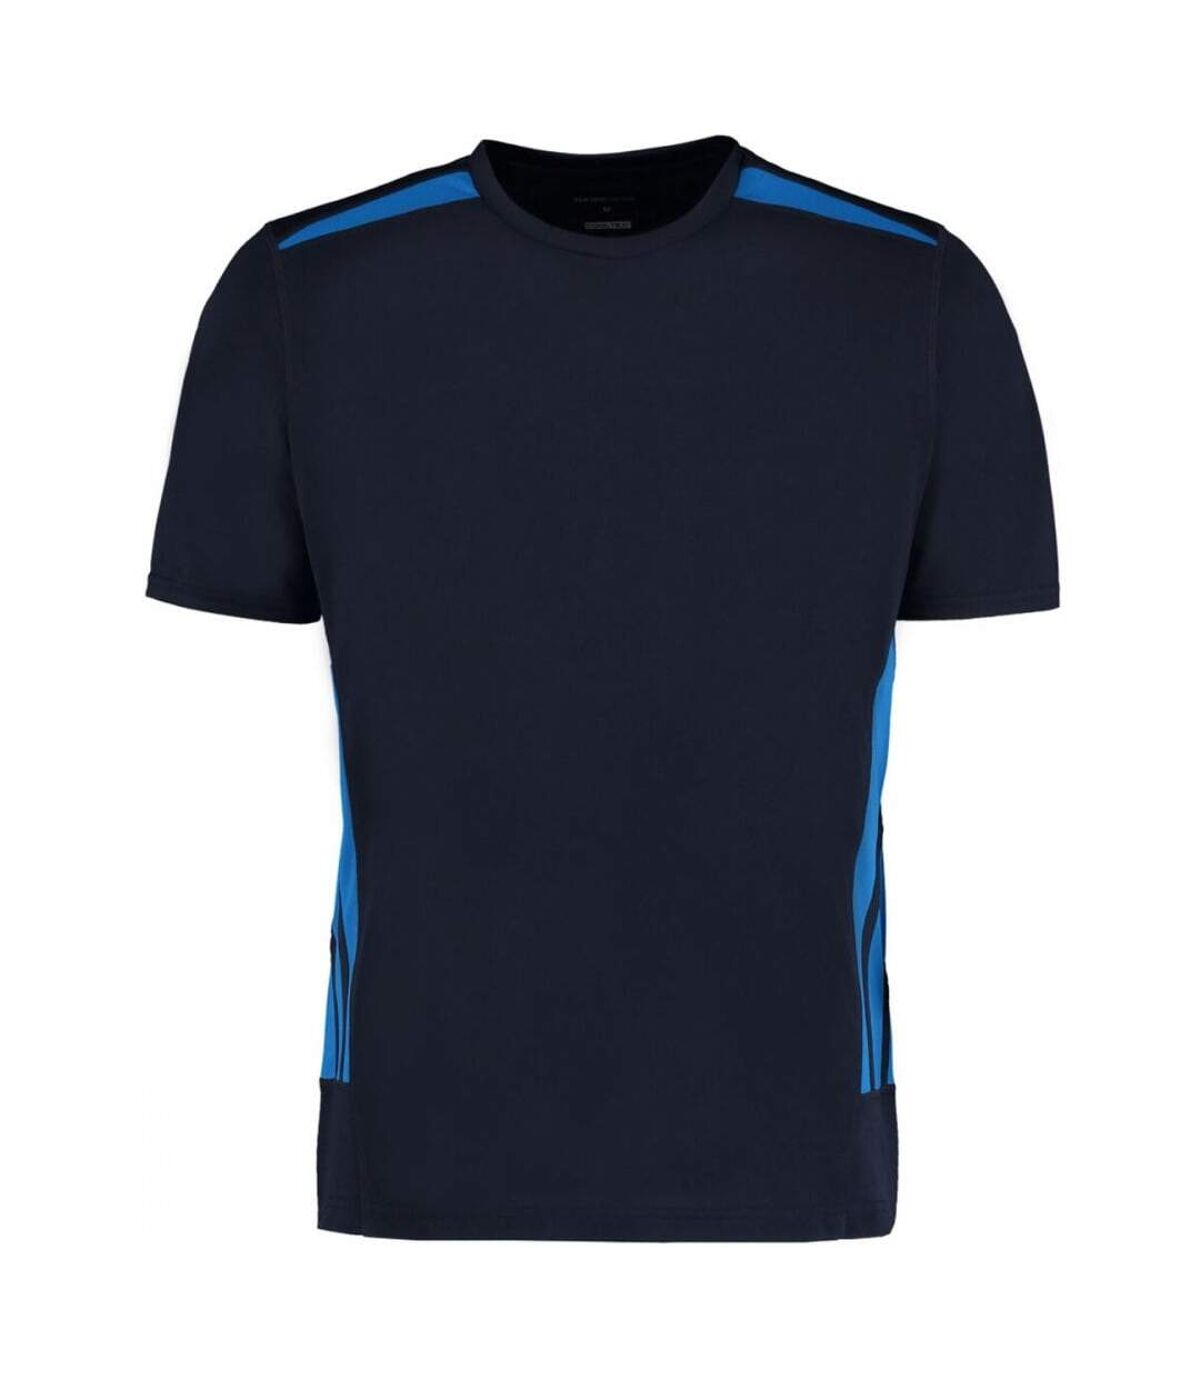 Gamegear® Mens Cooltex Short Sleeve Training T-Shirt (Navy/Electric Blue) - UTBC417